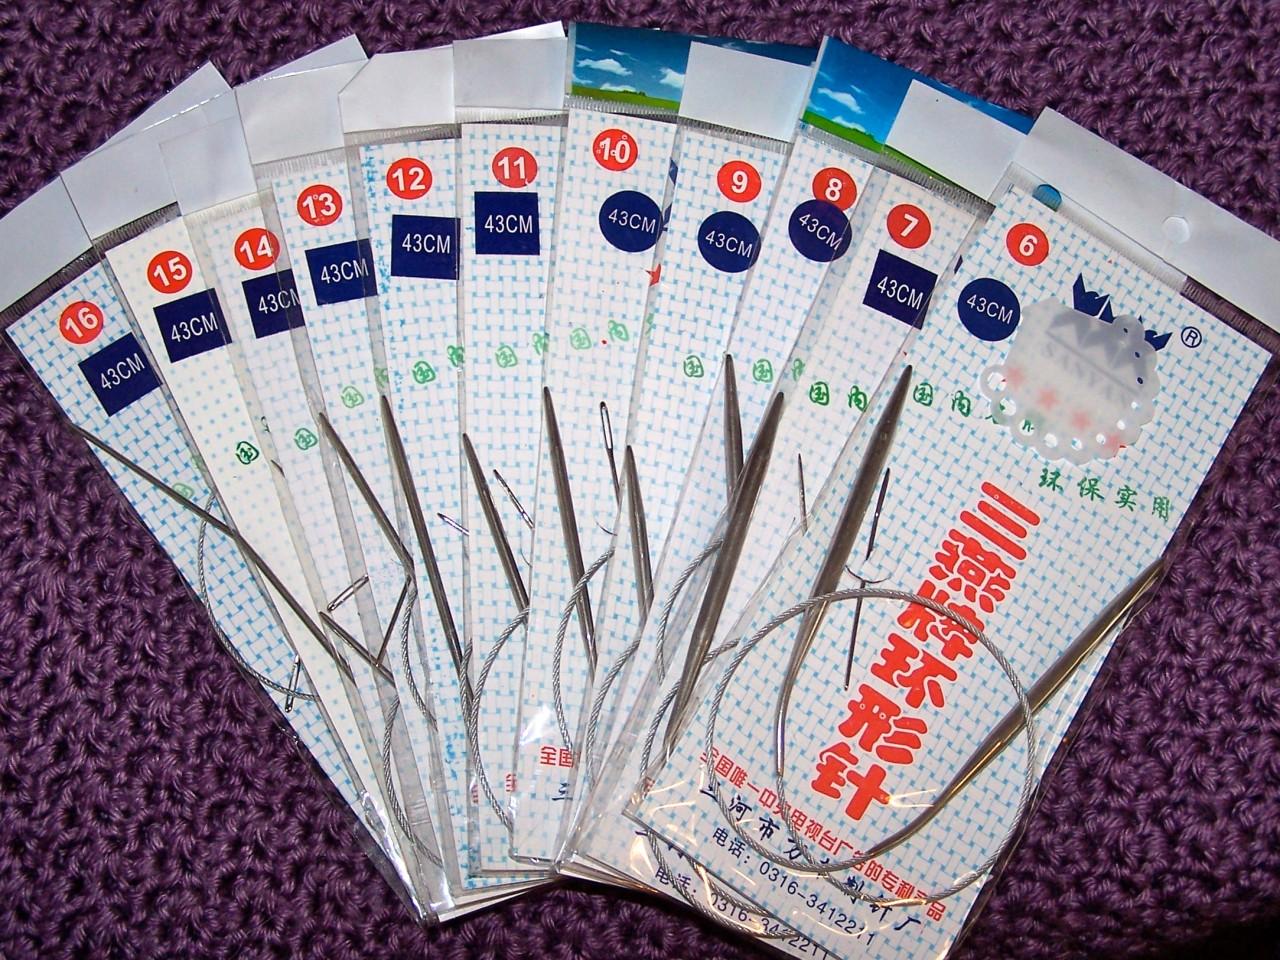 11pcs16-034-24-034-or-32-034-Stainless-Steel-Circular-Knitting-Needles-UK-Sizes-12-Stitch